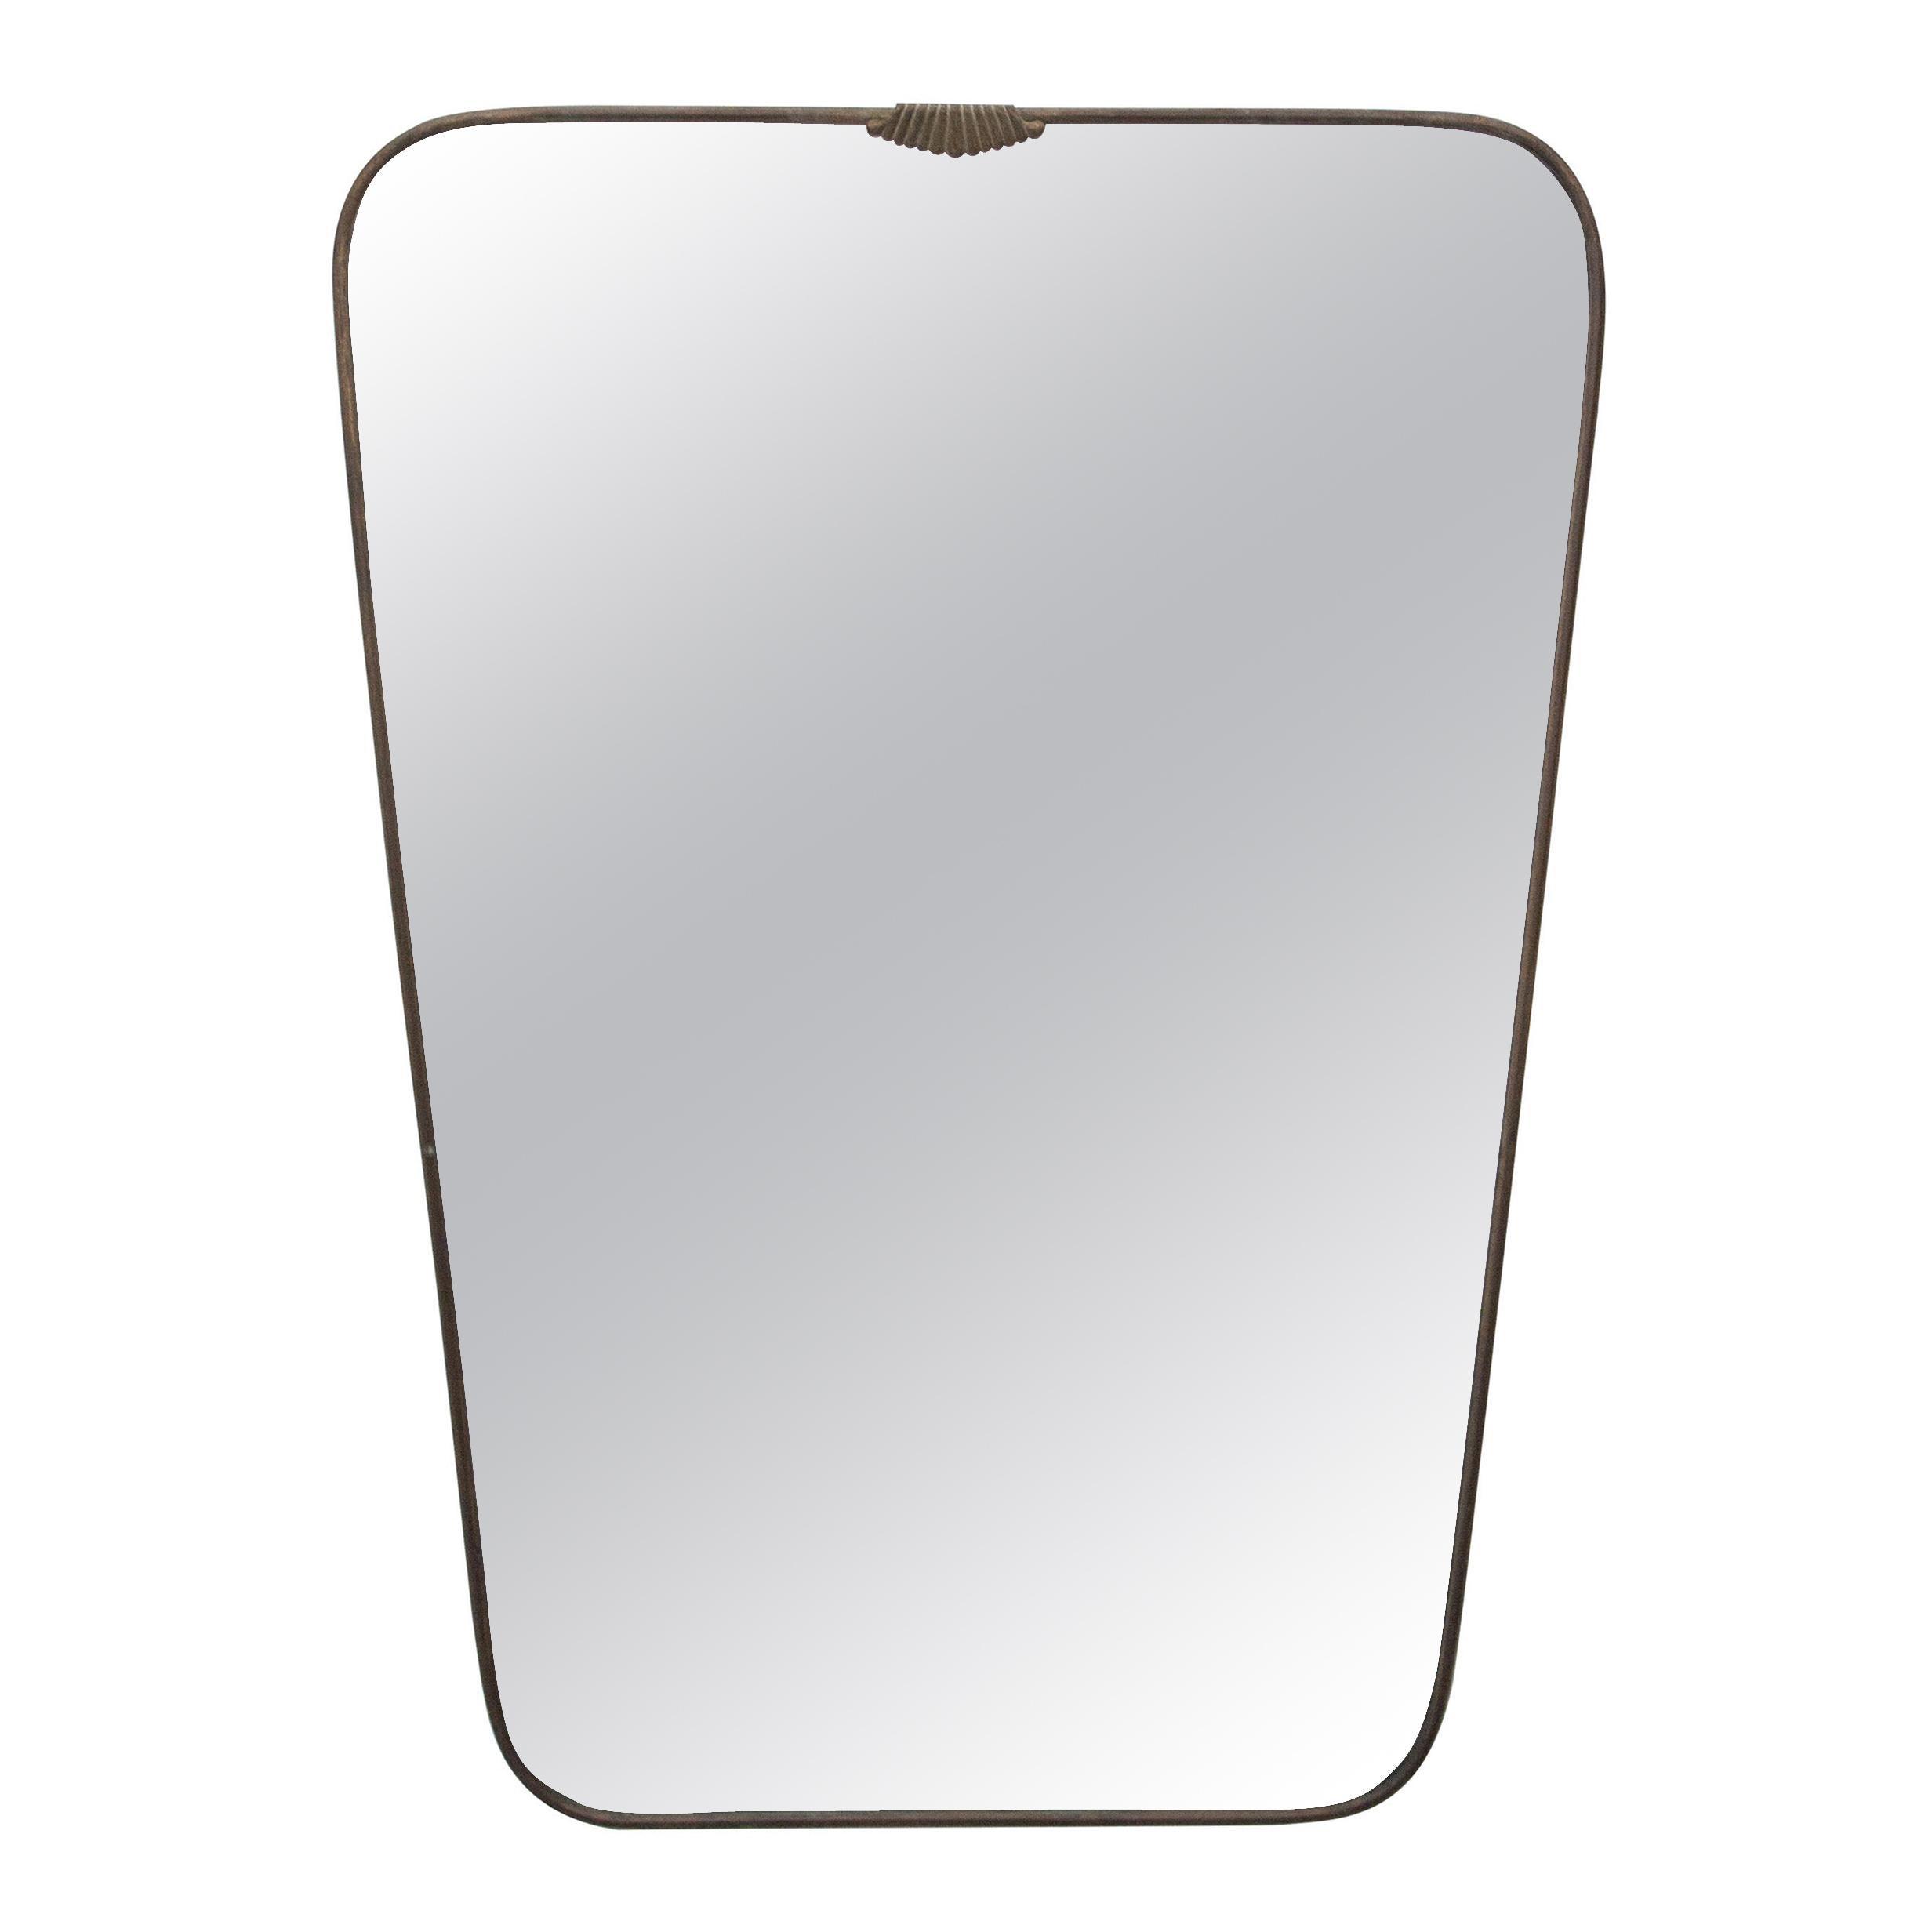 Gio Ponti Style Mid-Century Modern Brass Shield Form Mirror, Italy, 1950